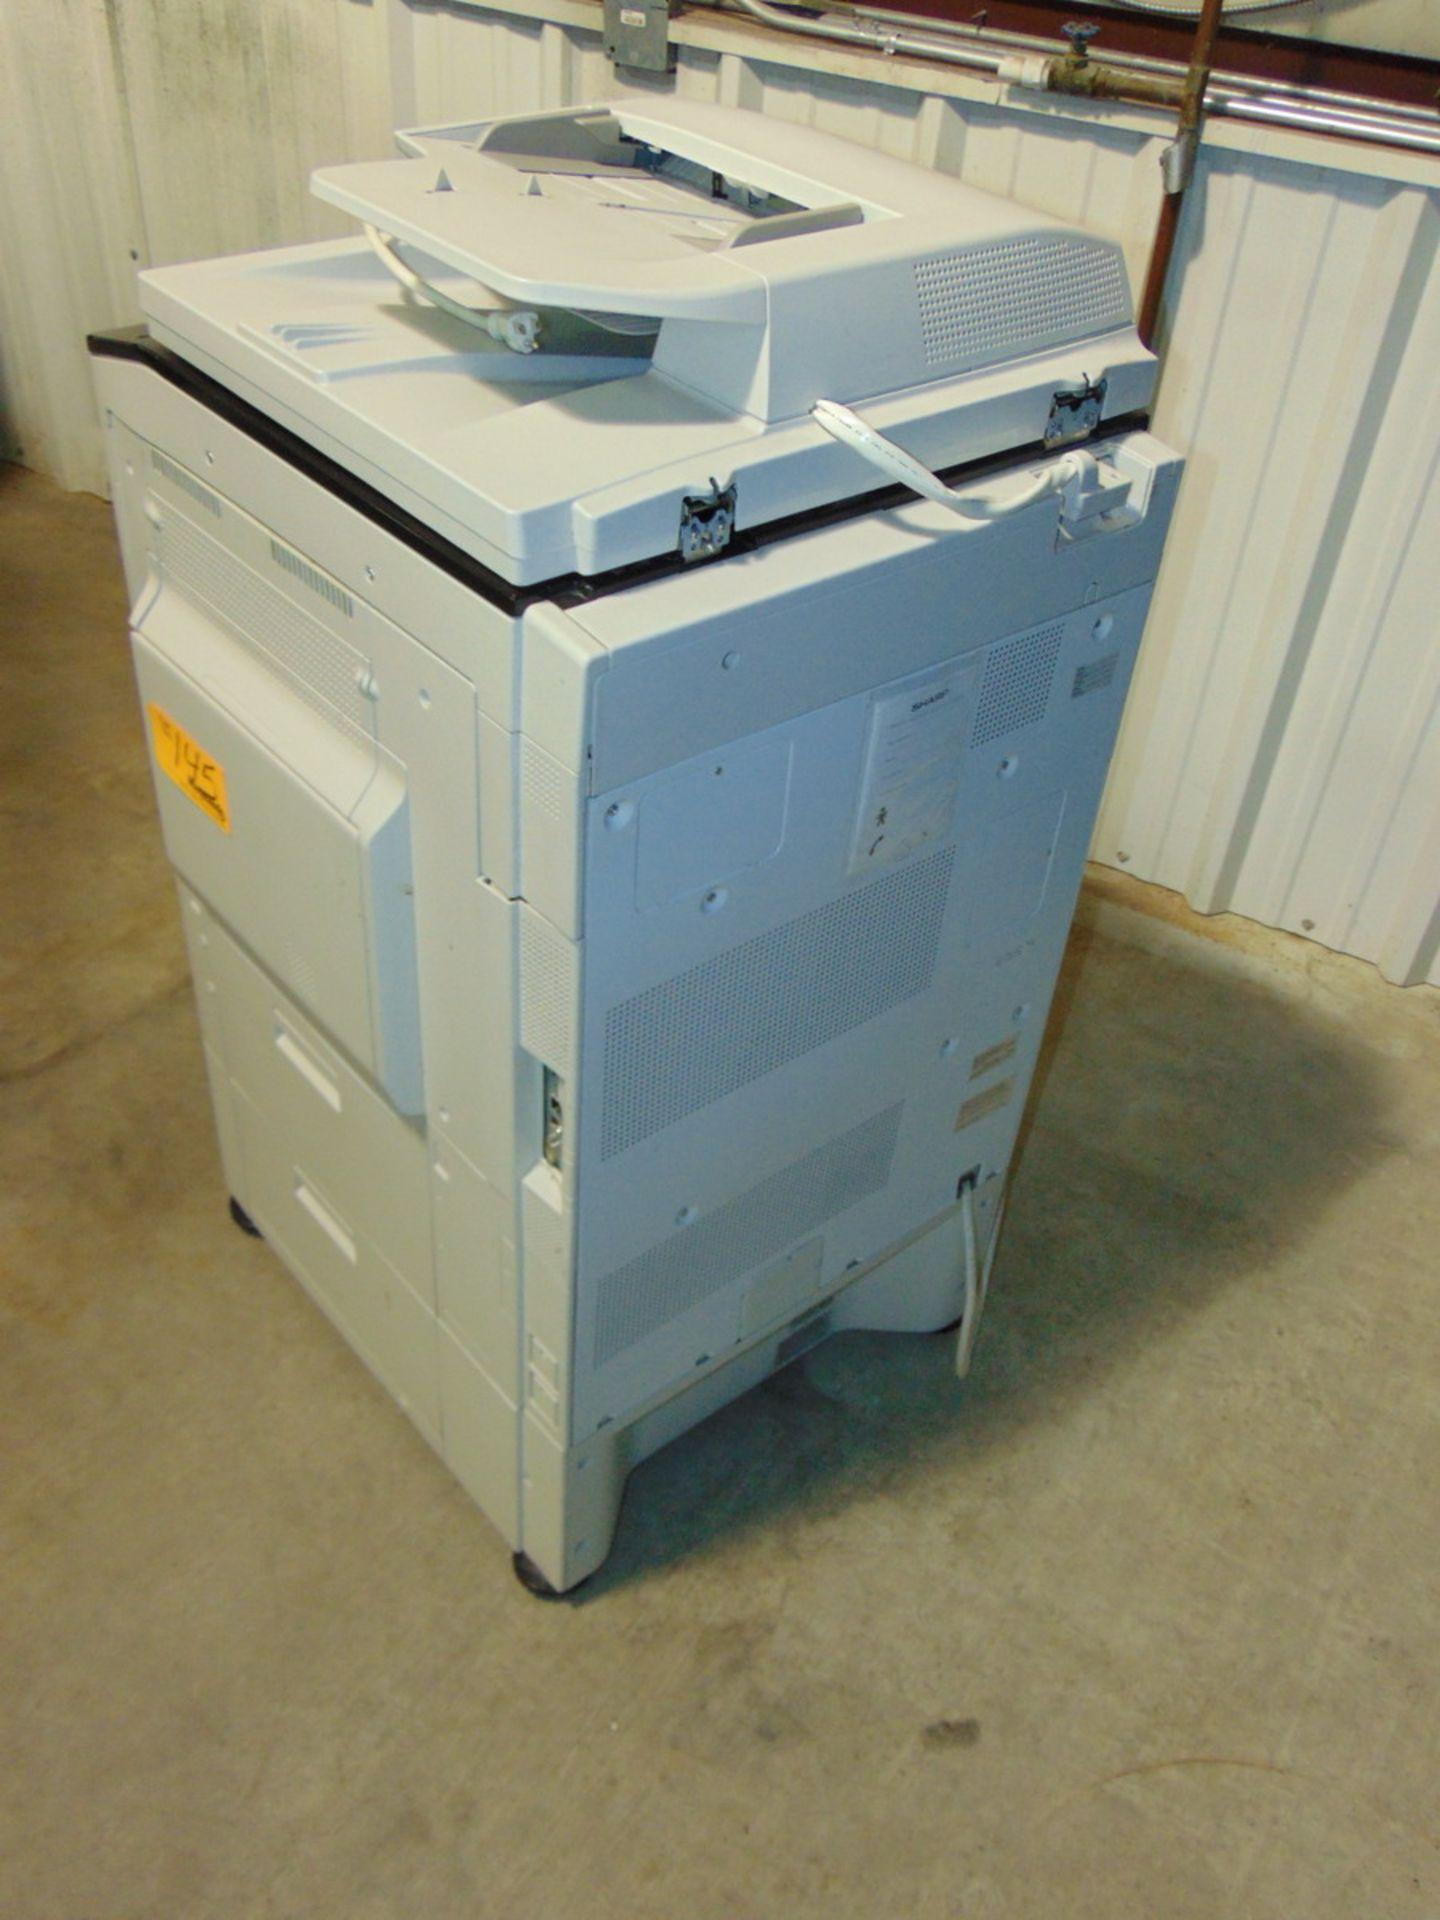 Lot 145 - 2008 Sharp MX-3100N Multifunction Color Printer / Copier / Scanner